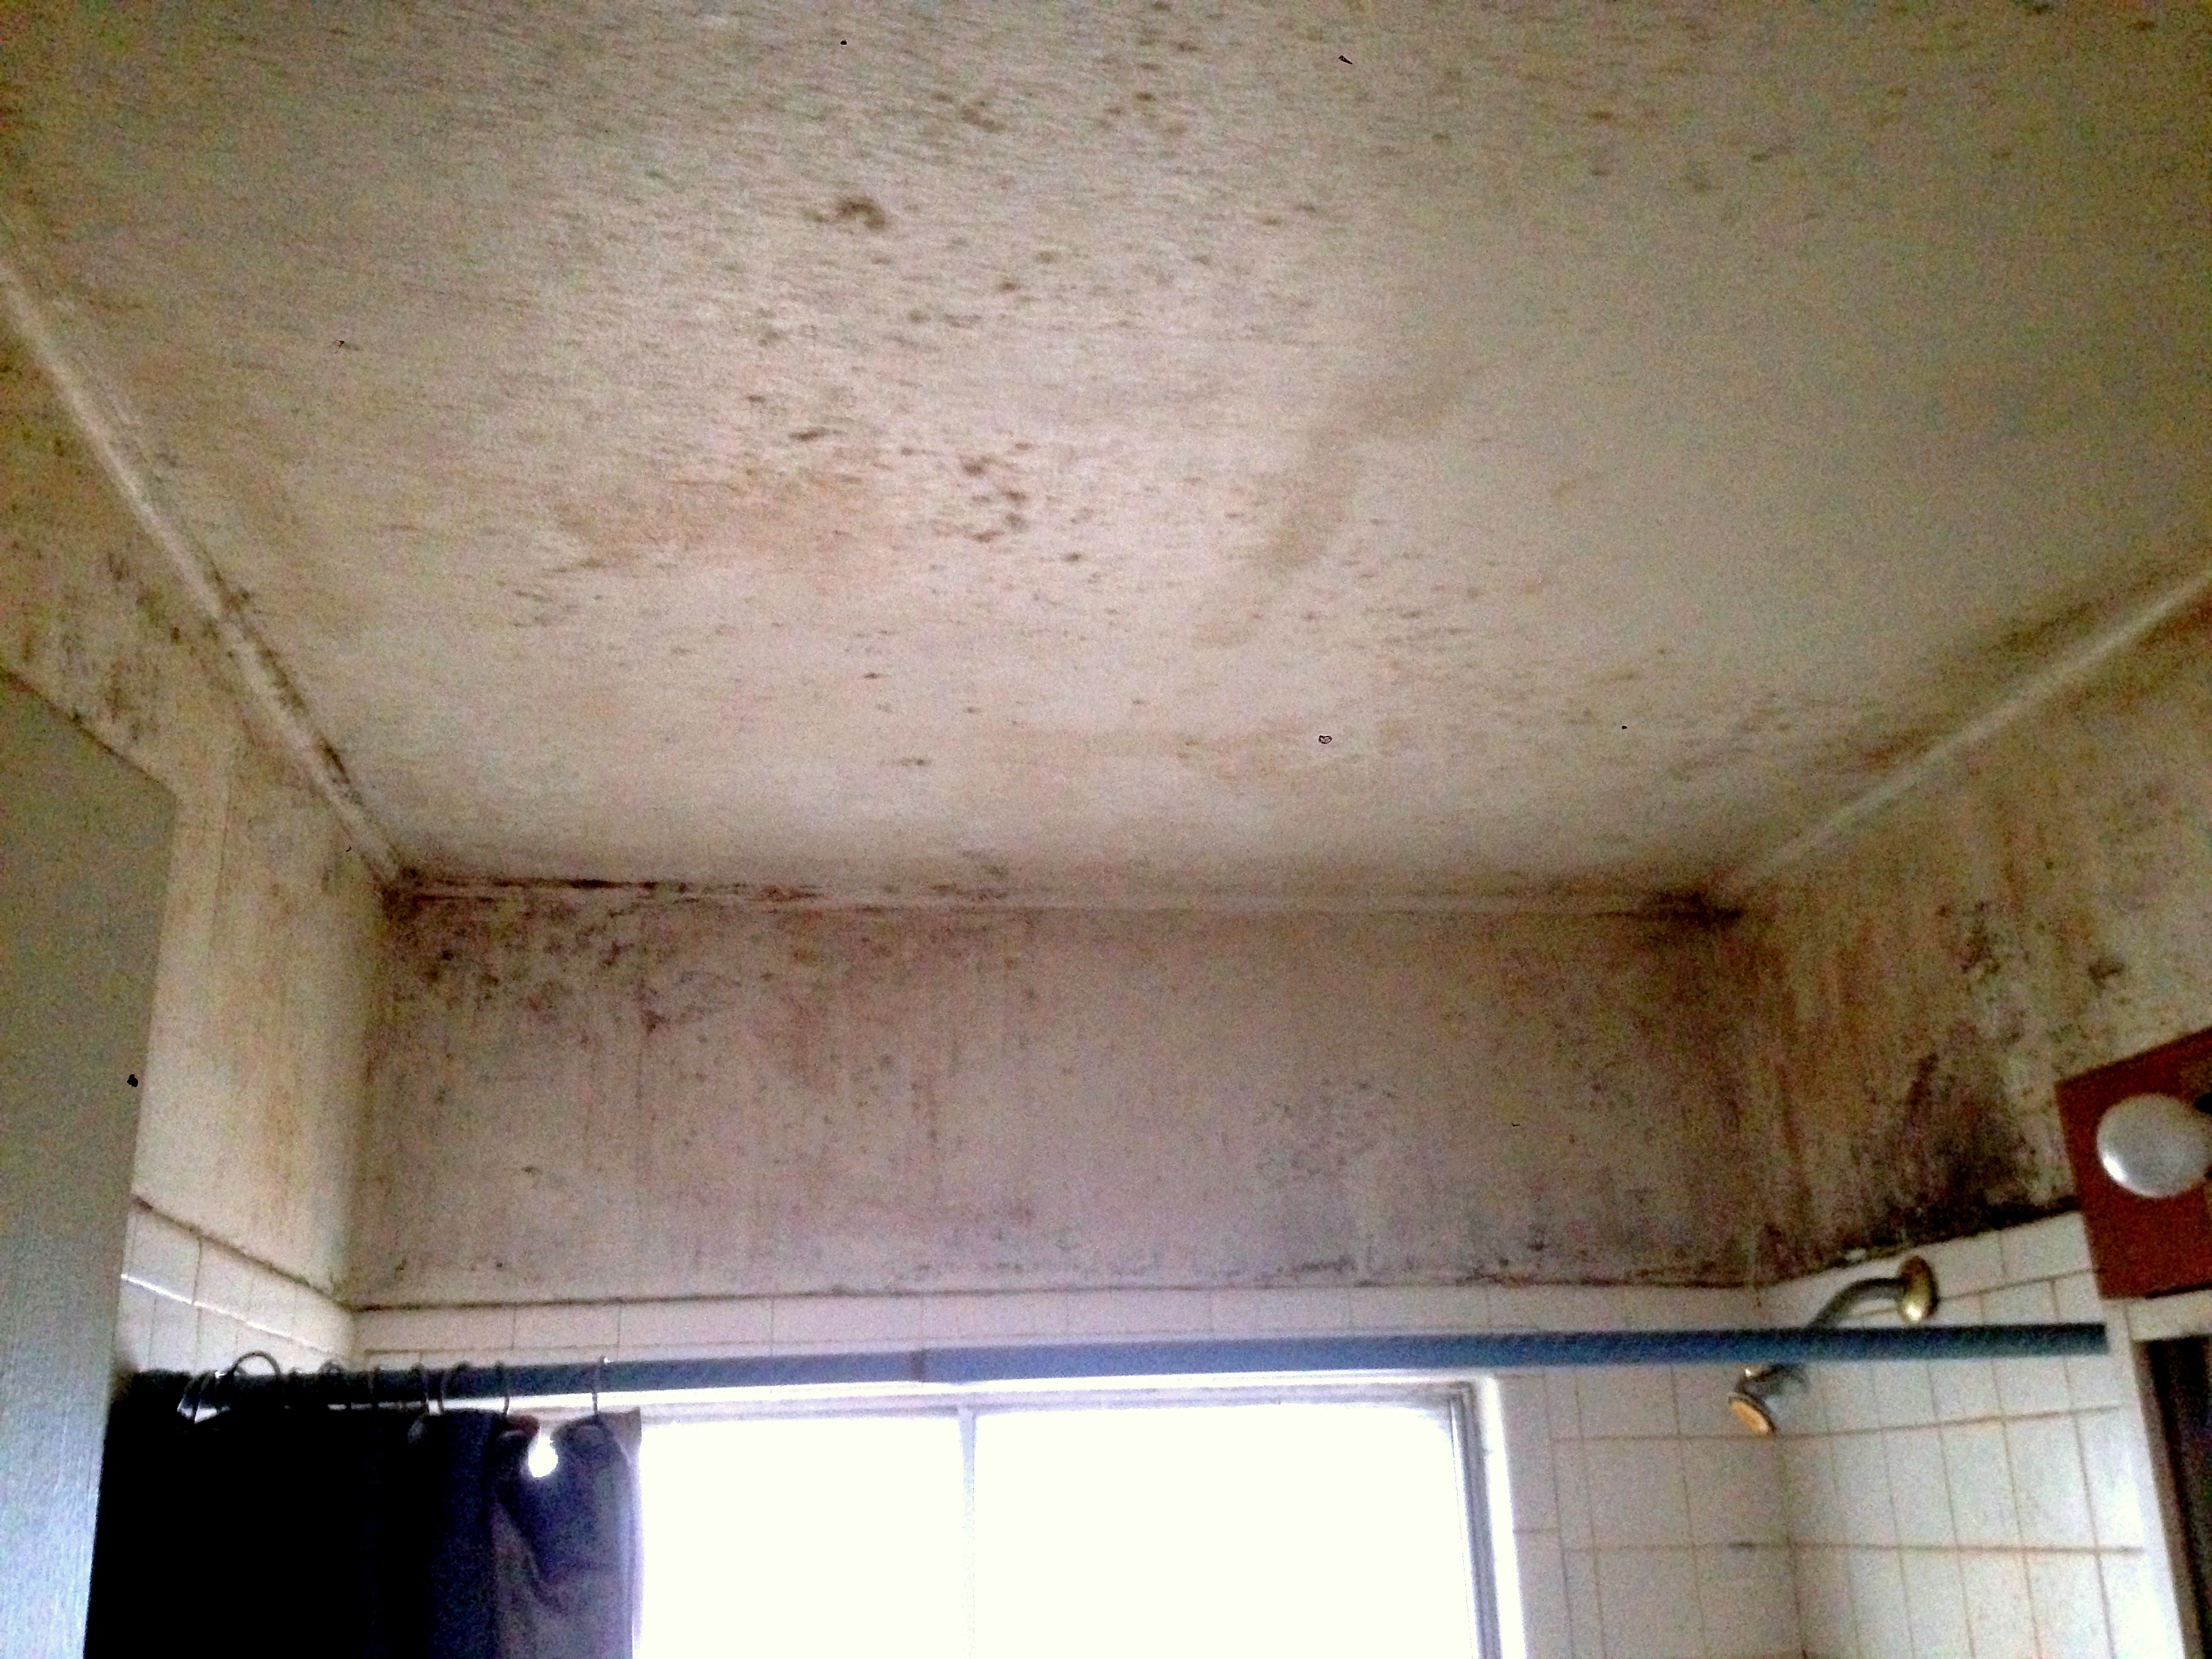 Mold_on_ceiling_of_bathroom.jpg